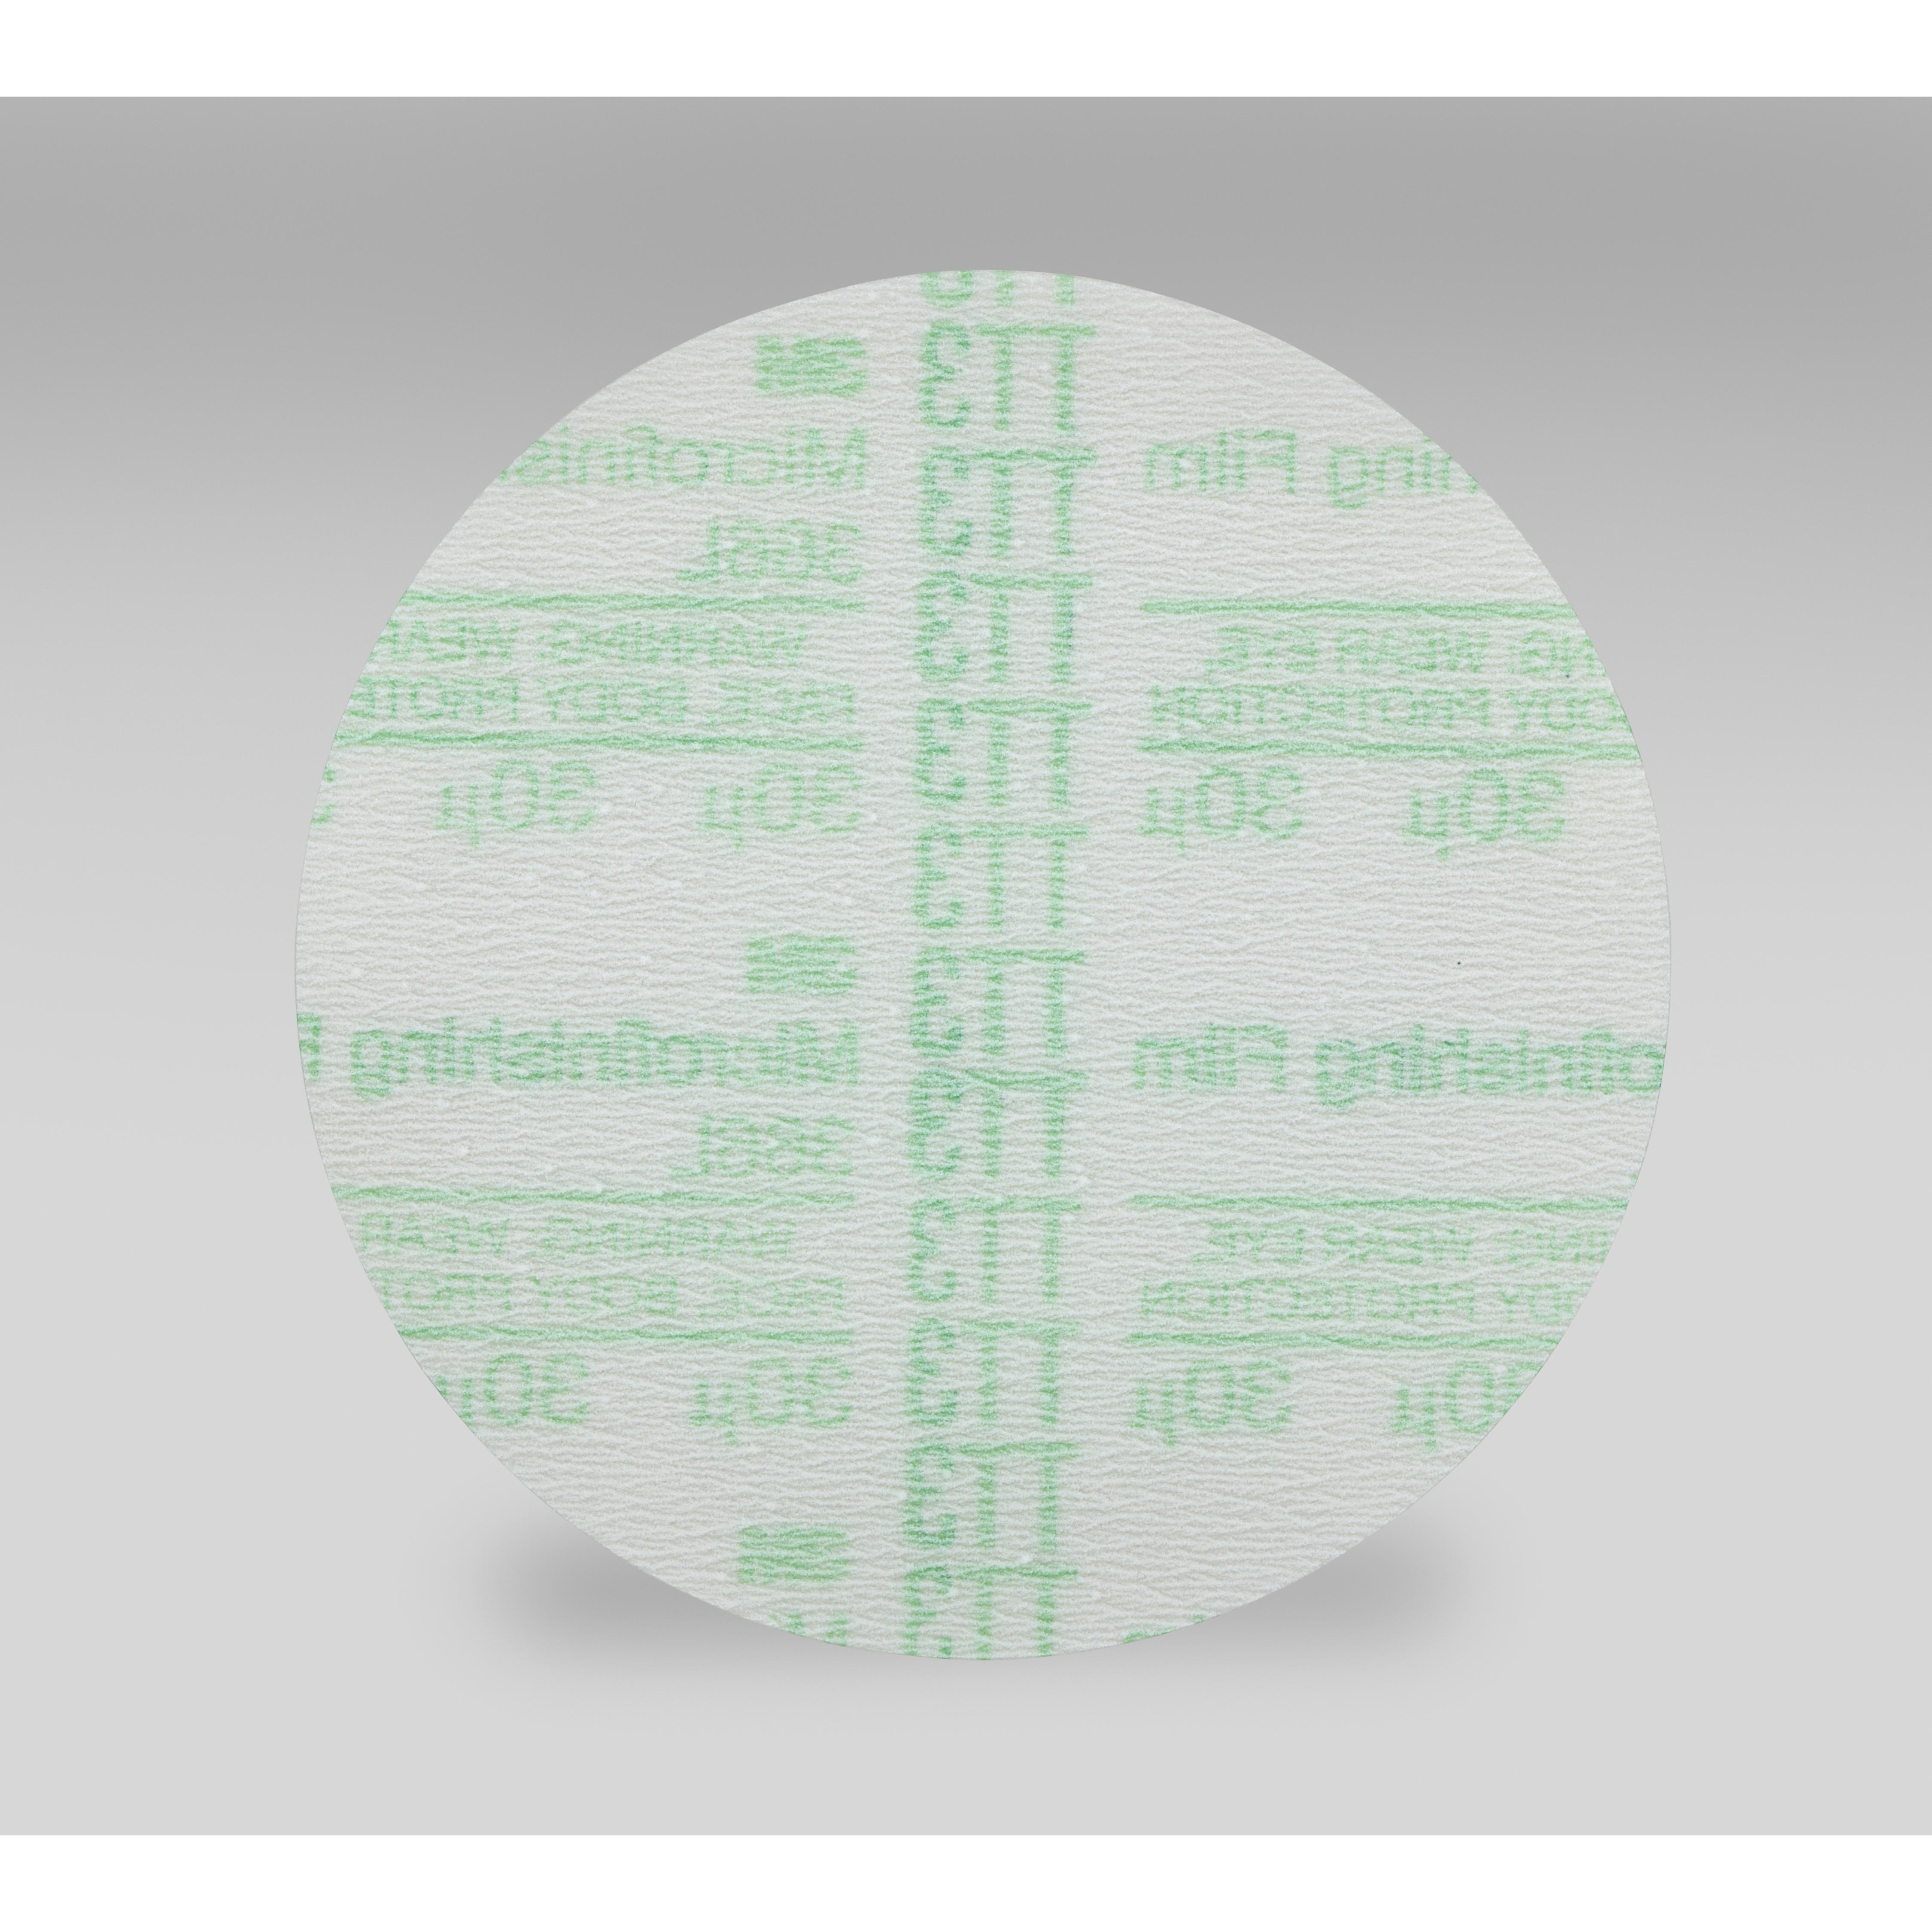 3M™ Hookit™ 051111-53827 366L Microfinishing Abrasive Disc, 3 in Dia Disc, 30 micron Grit, Extra Fine Grade, Aluminum Oxide Abrasive, Polyester Film Backing